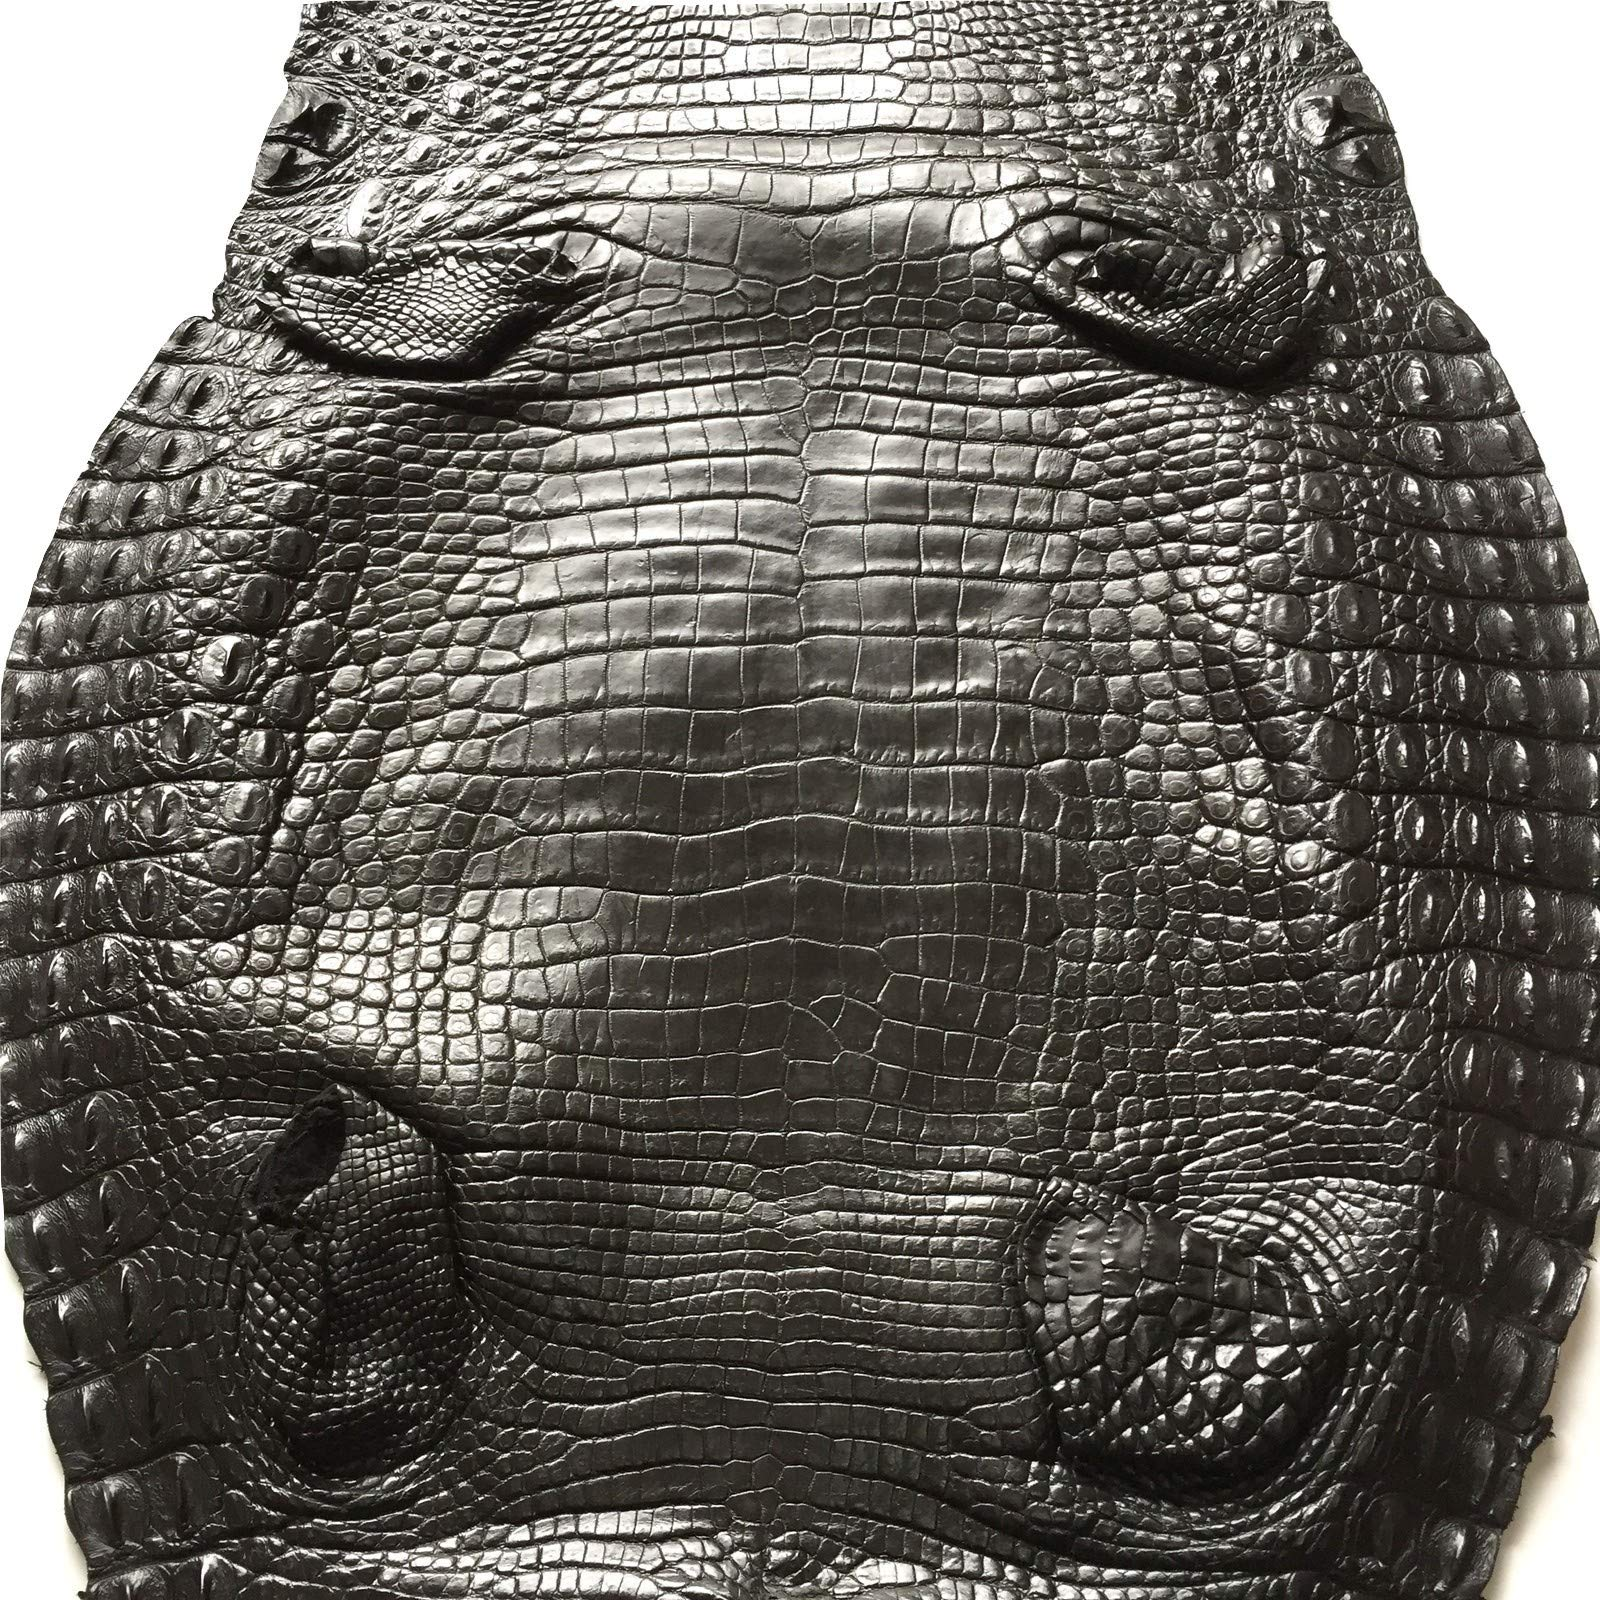 Crocodile Skin Leather Hide Belly 40cm